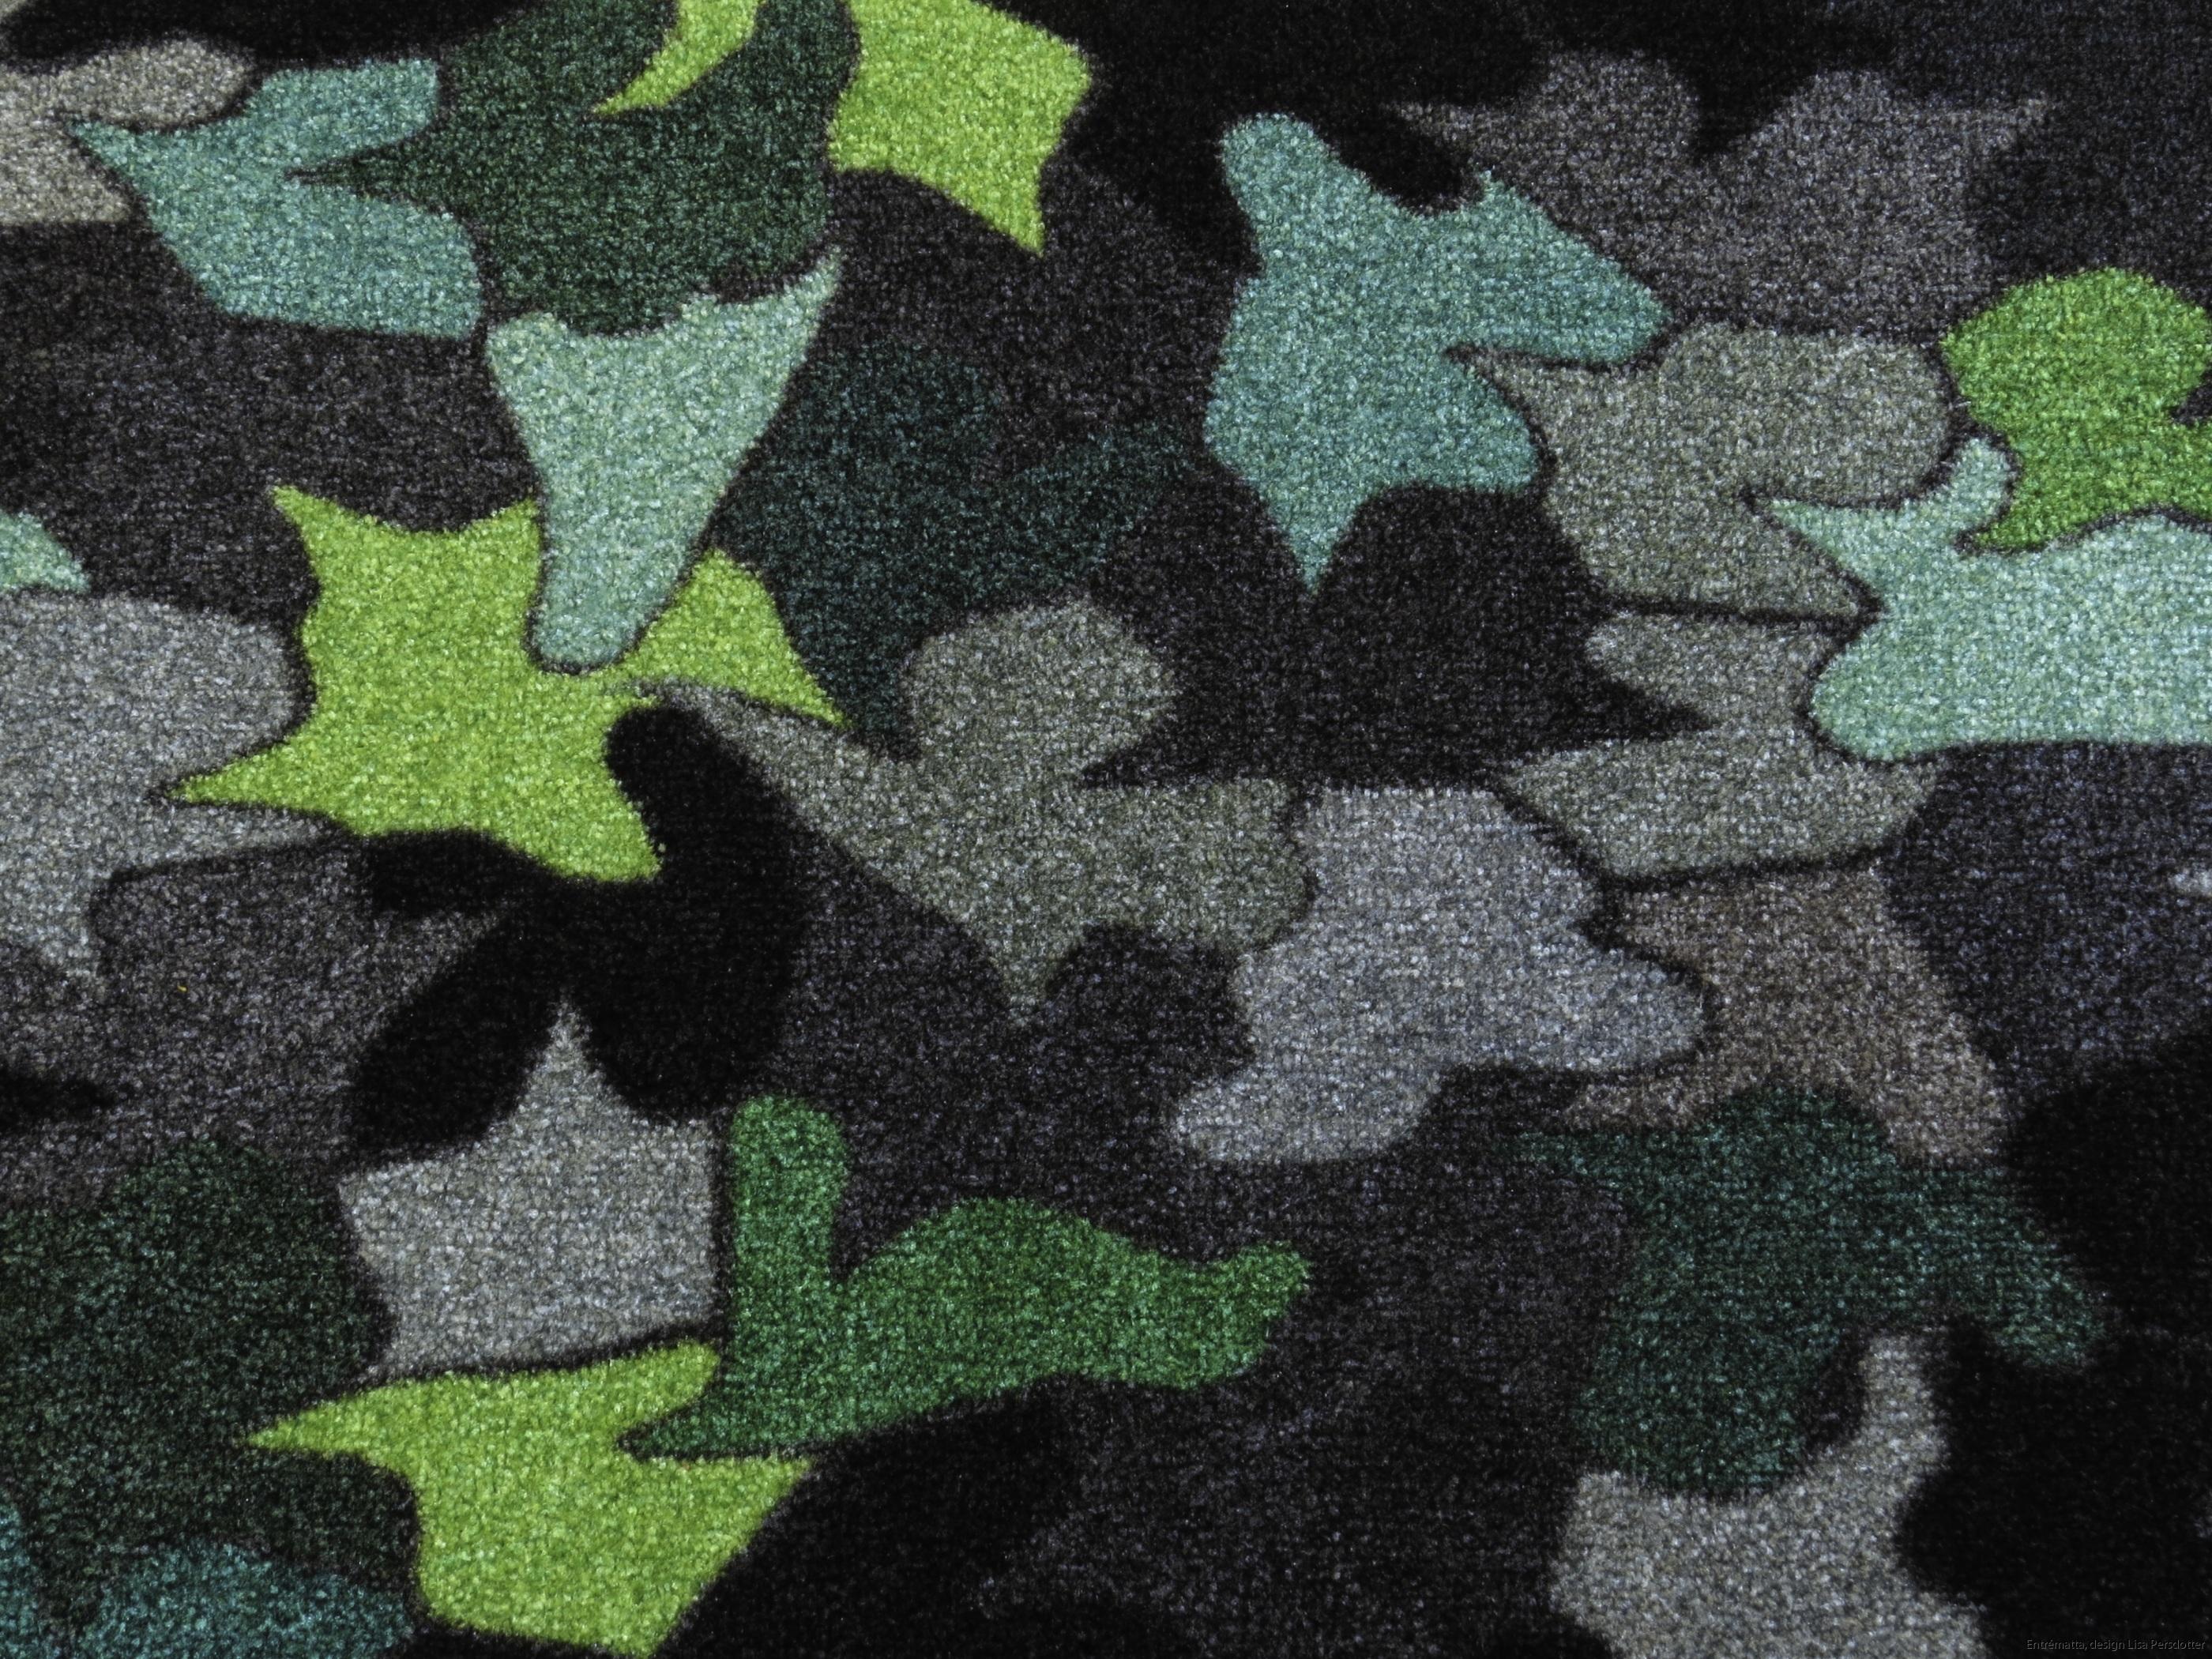 hallmatta grå grön  design Lisa Persdotter colorjoy.se